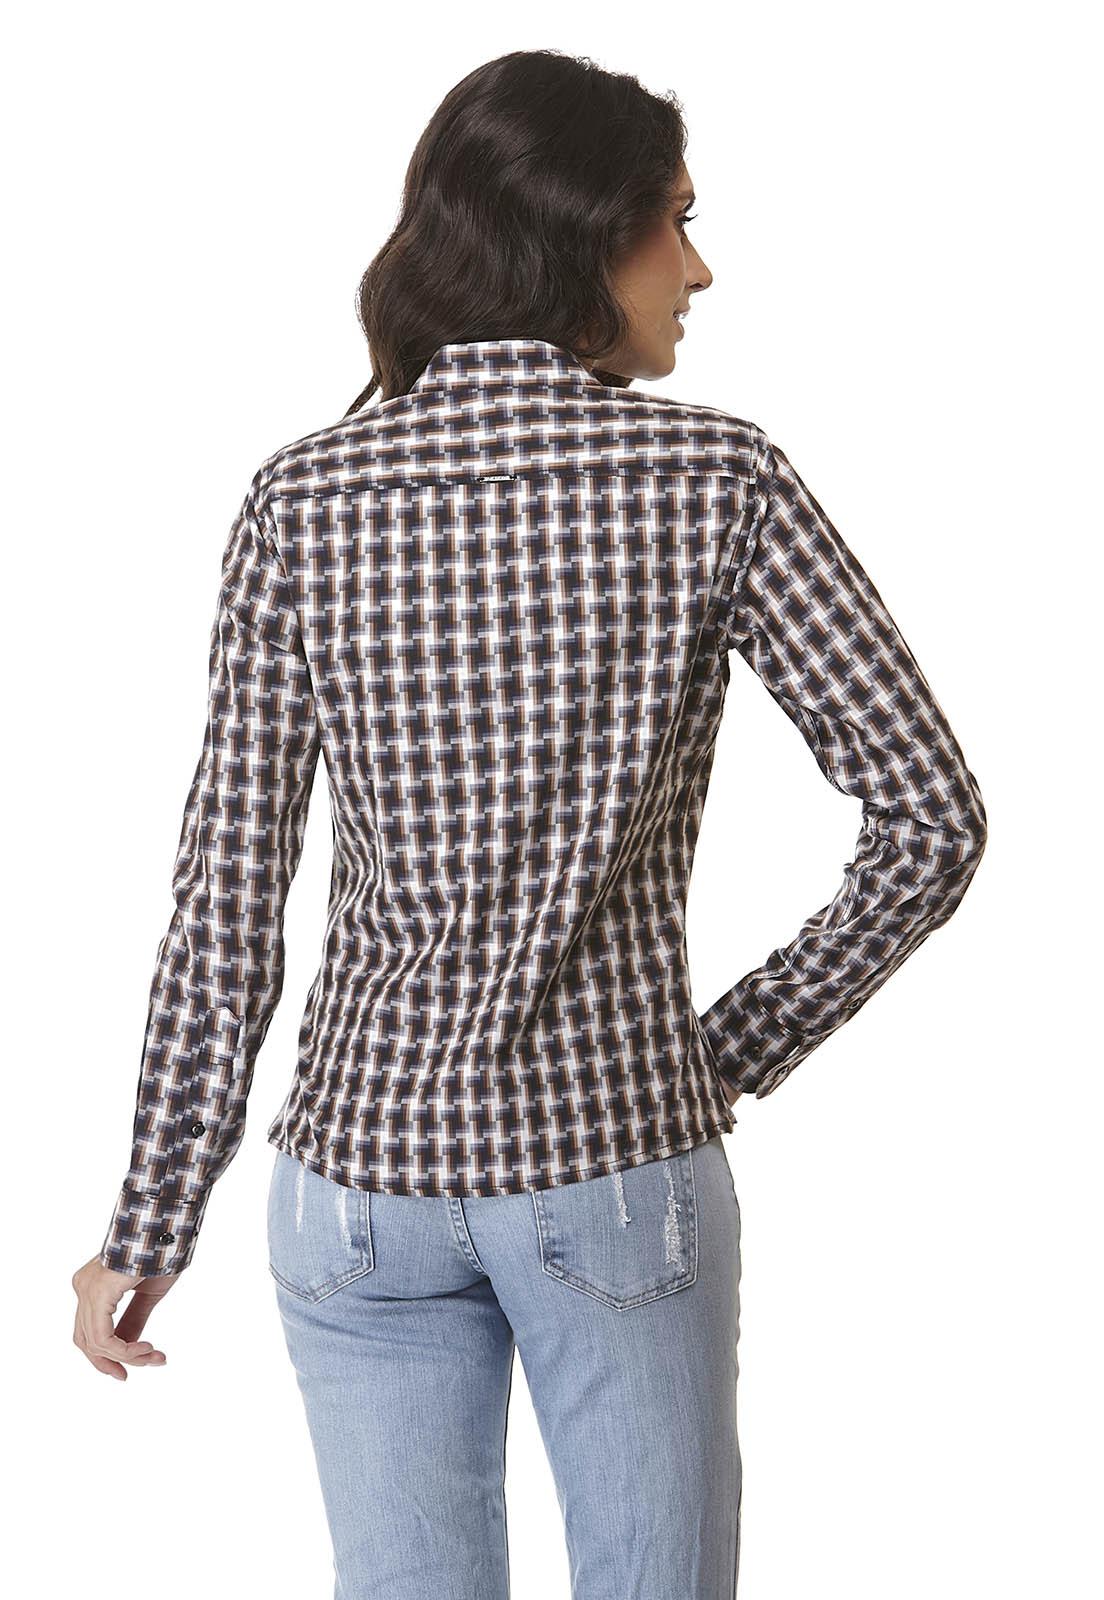 Kit 3 Camisas Xadrez Feminina Manga Longa Frete Grátis